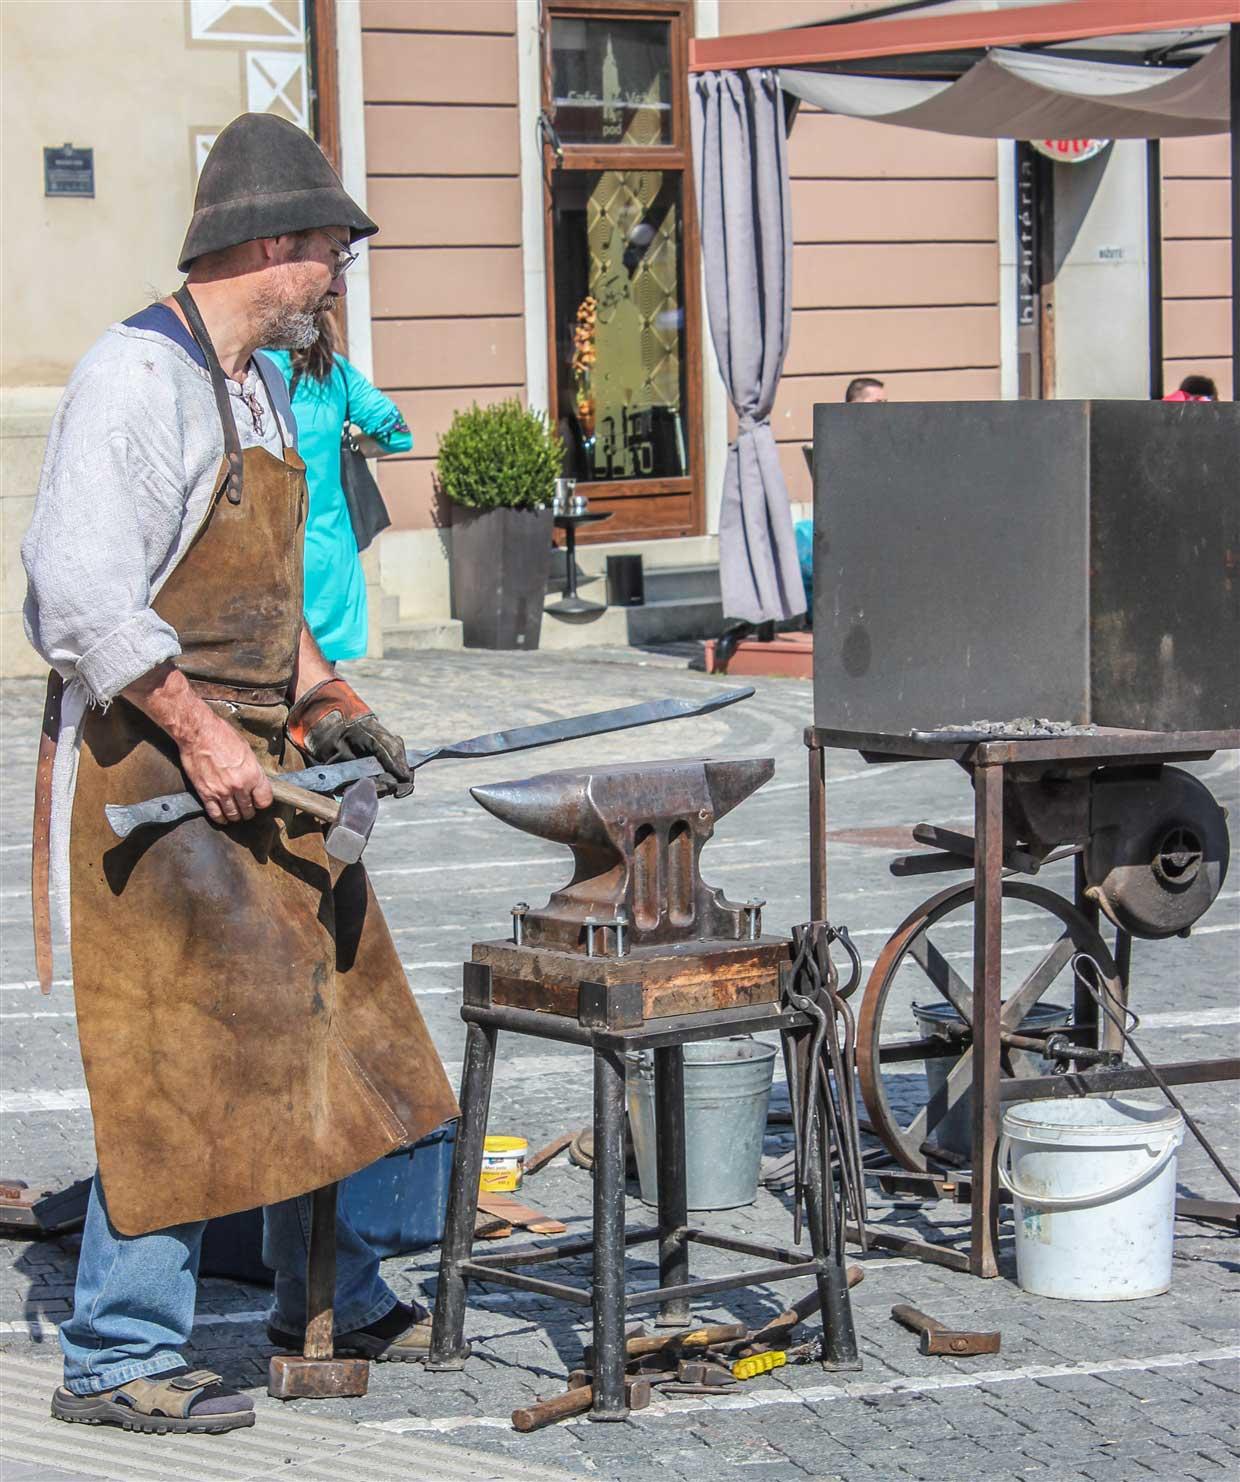 trvina-4-slovakia Slovakia – Trnava, a Taste of Tradition